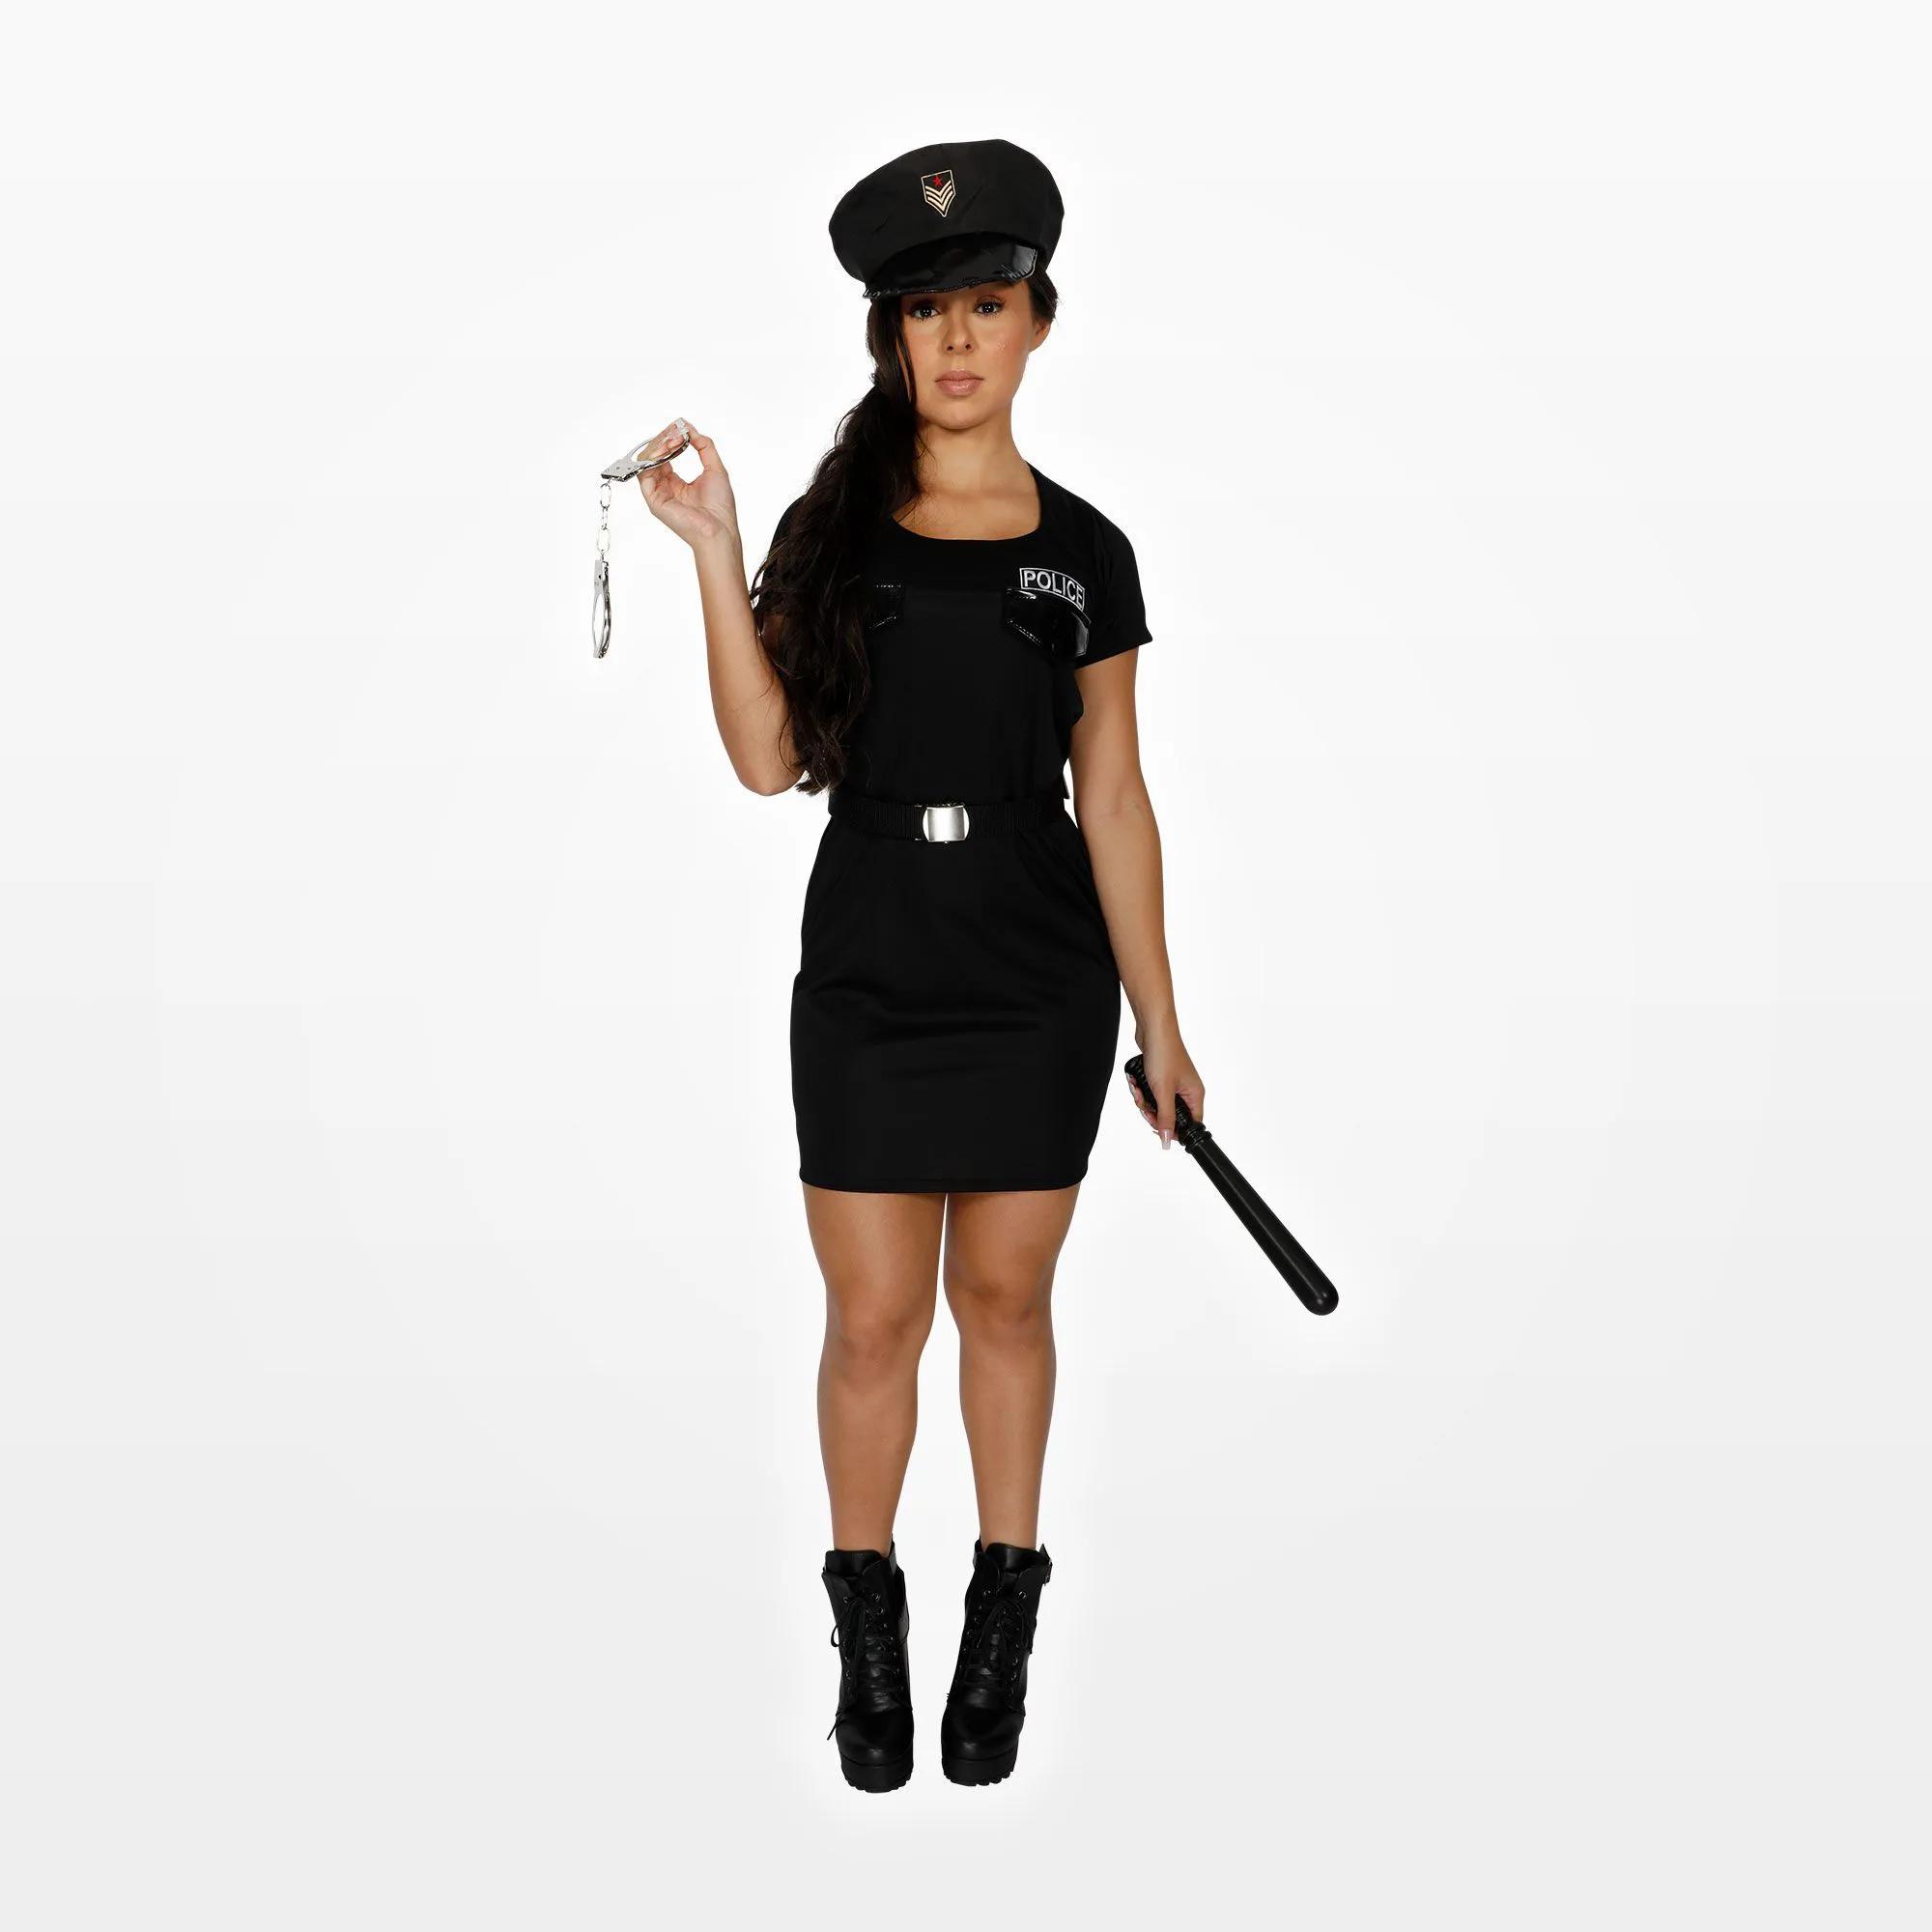 Fantasia Policial Vestido Feminino Adulto